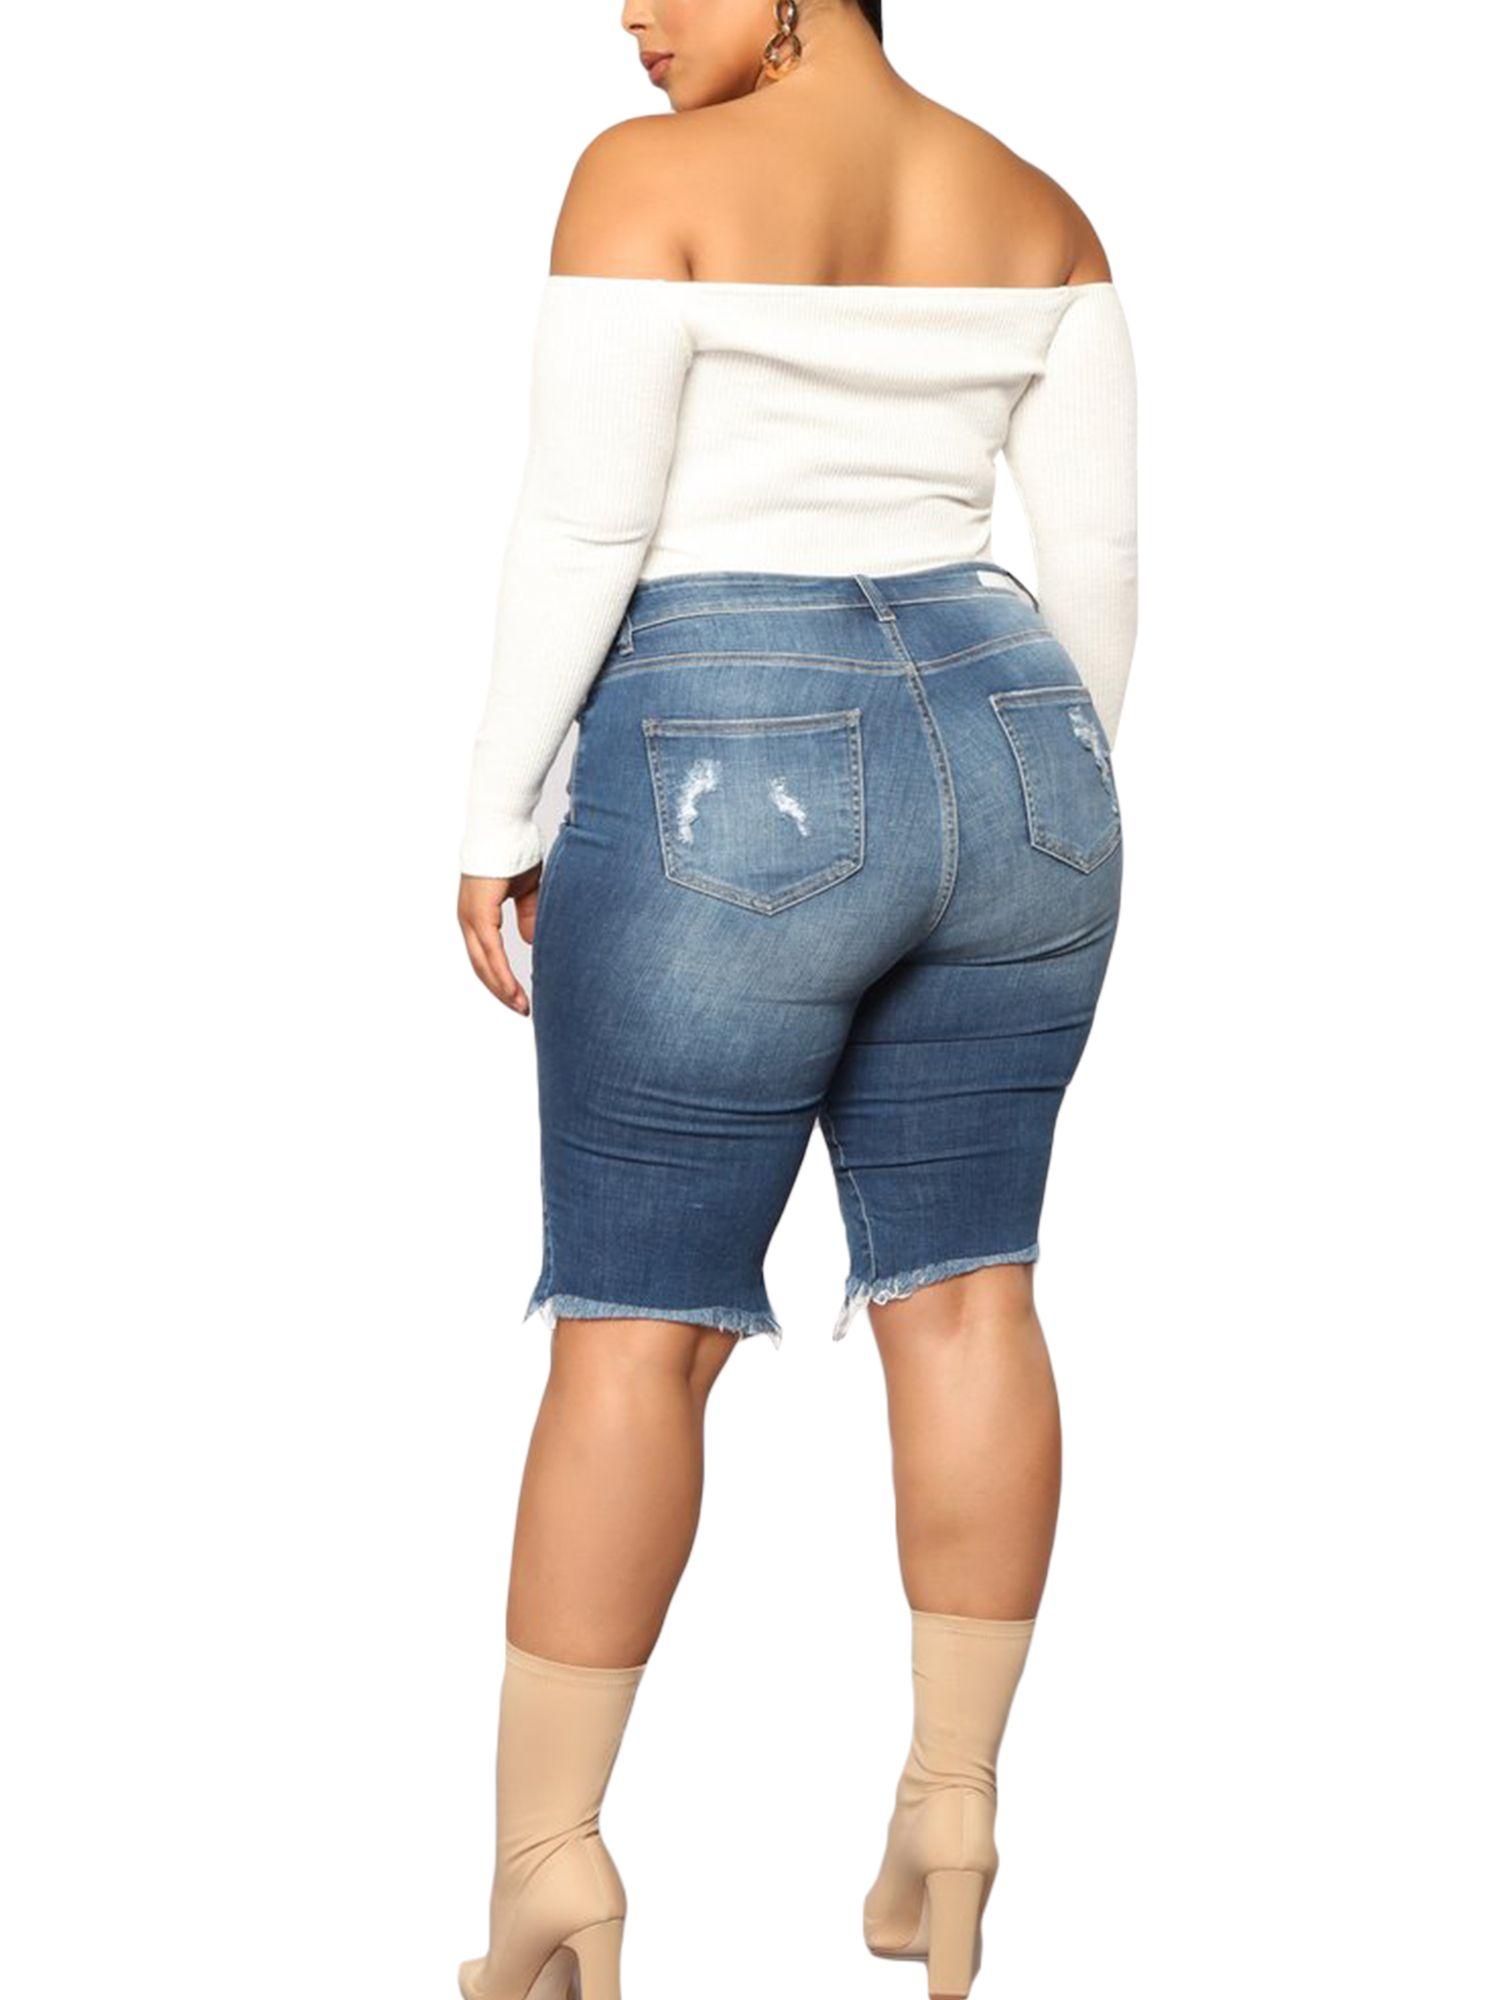 New Vintage Women High Waist Wide Leg Ripped Distressed Denim Jeans Shorts Pants